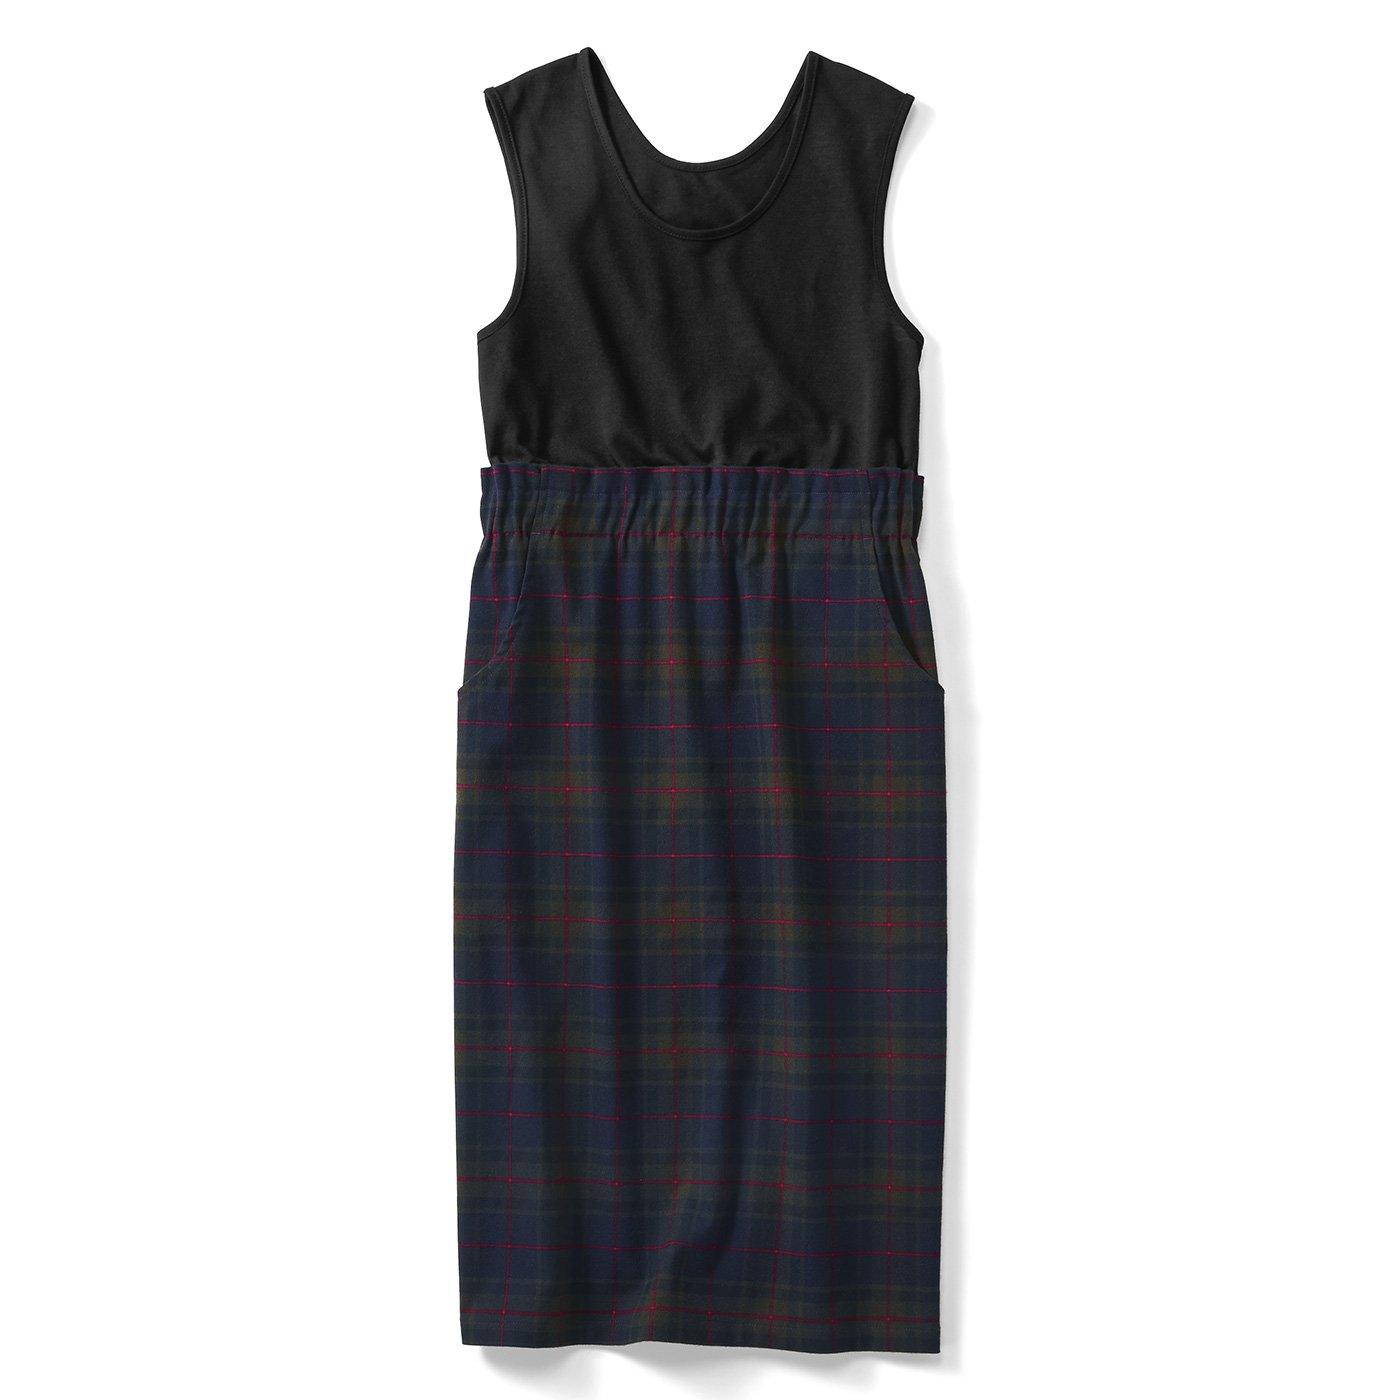 IEDIT[イディット] 上から吊ってるみたいでウエスト快適 タンクトップ付き 着映えチェック柄のⅠラインスカート〈ネイビー〉